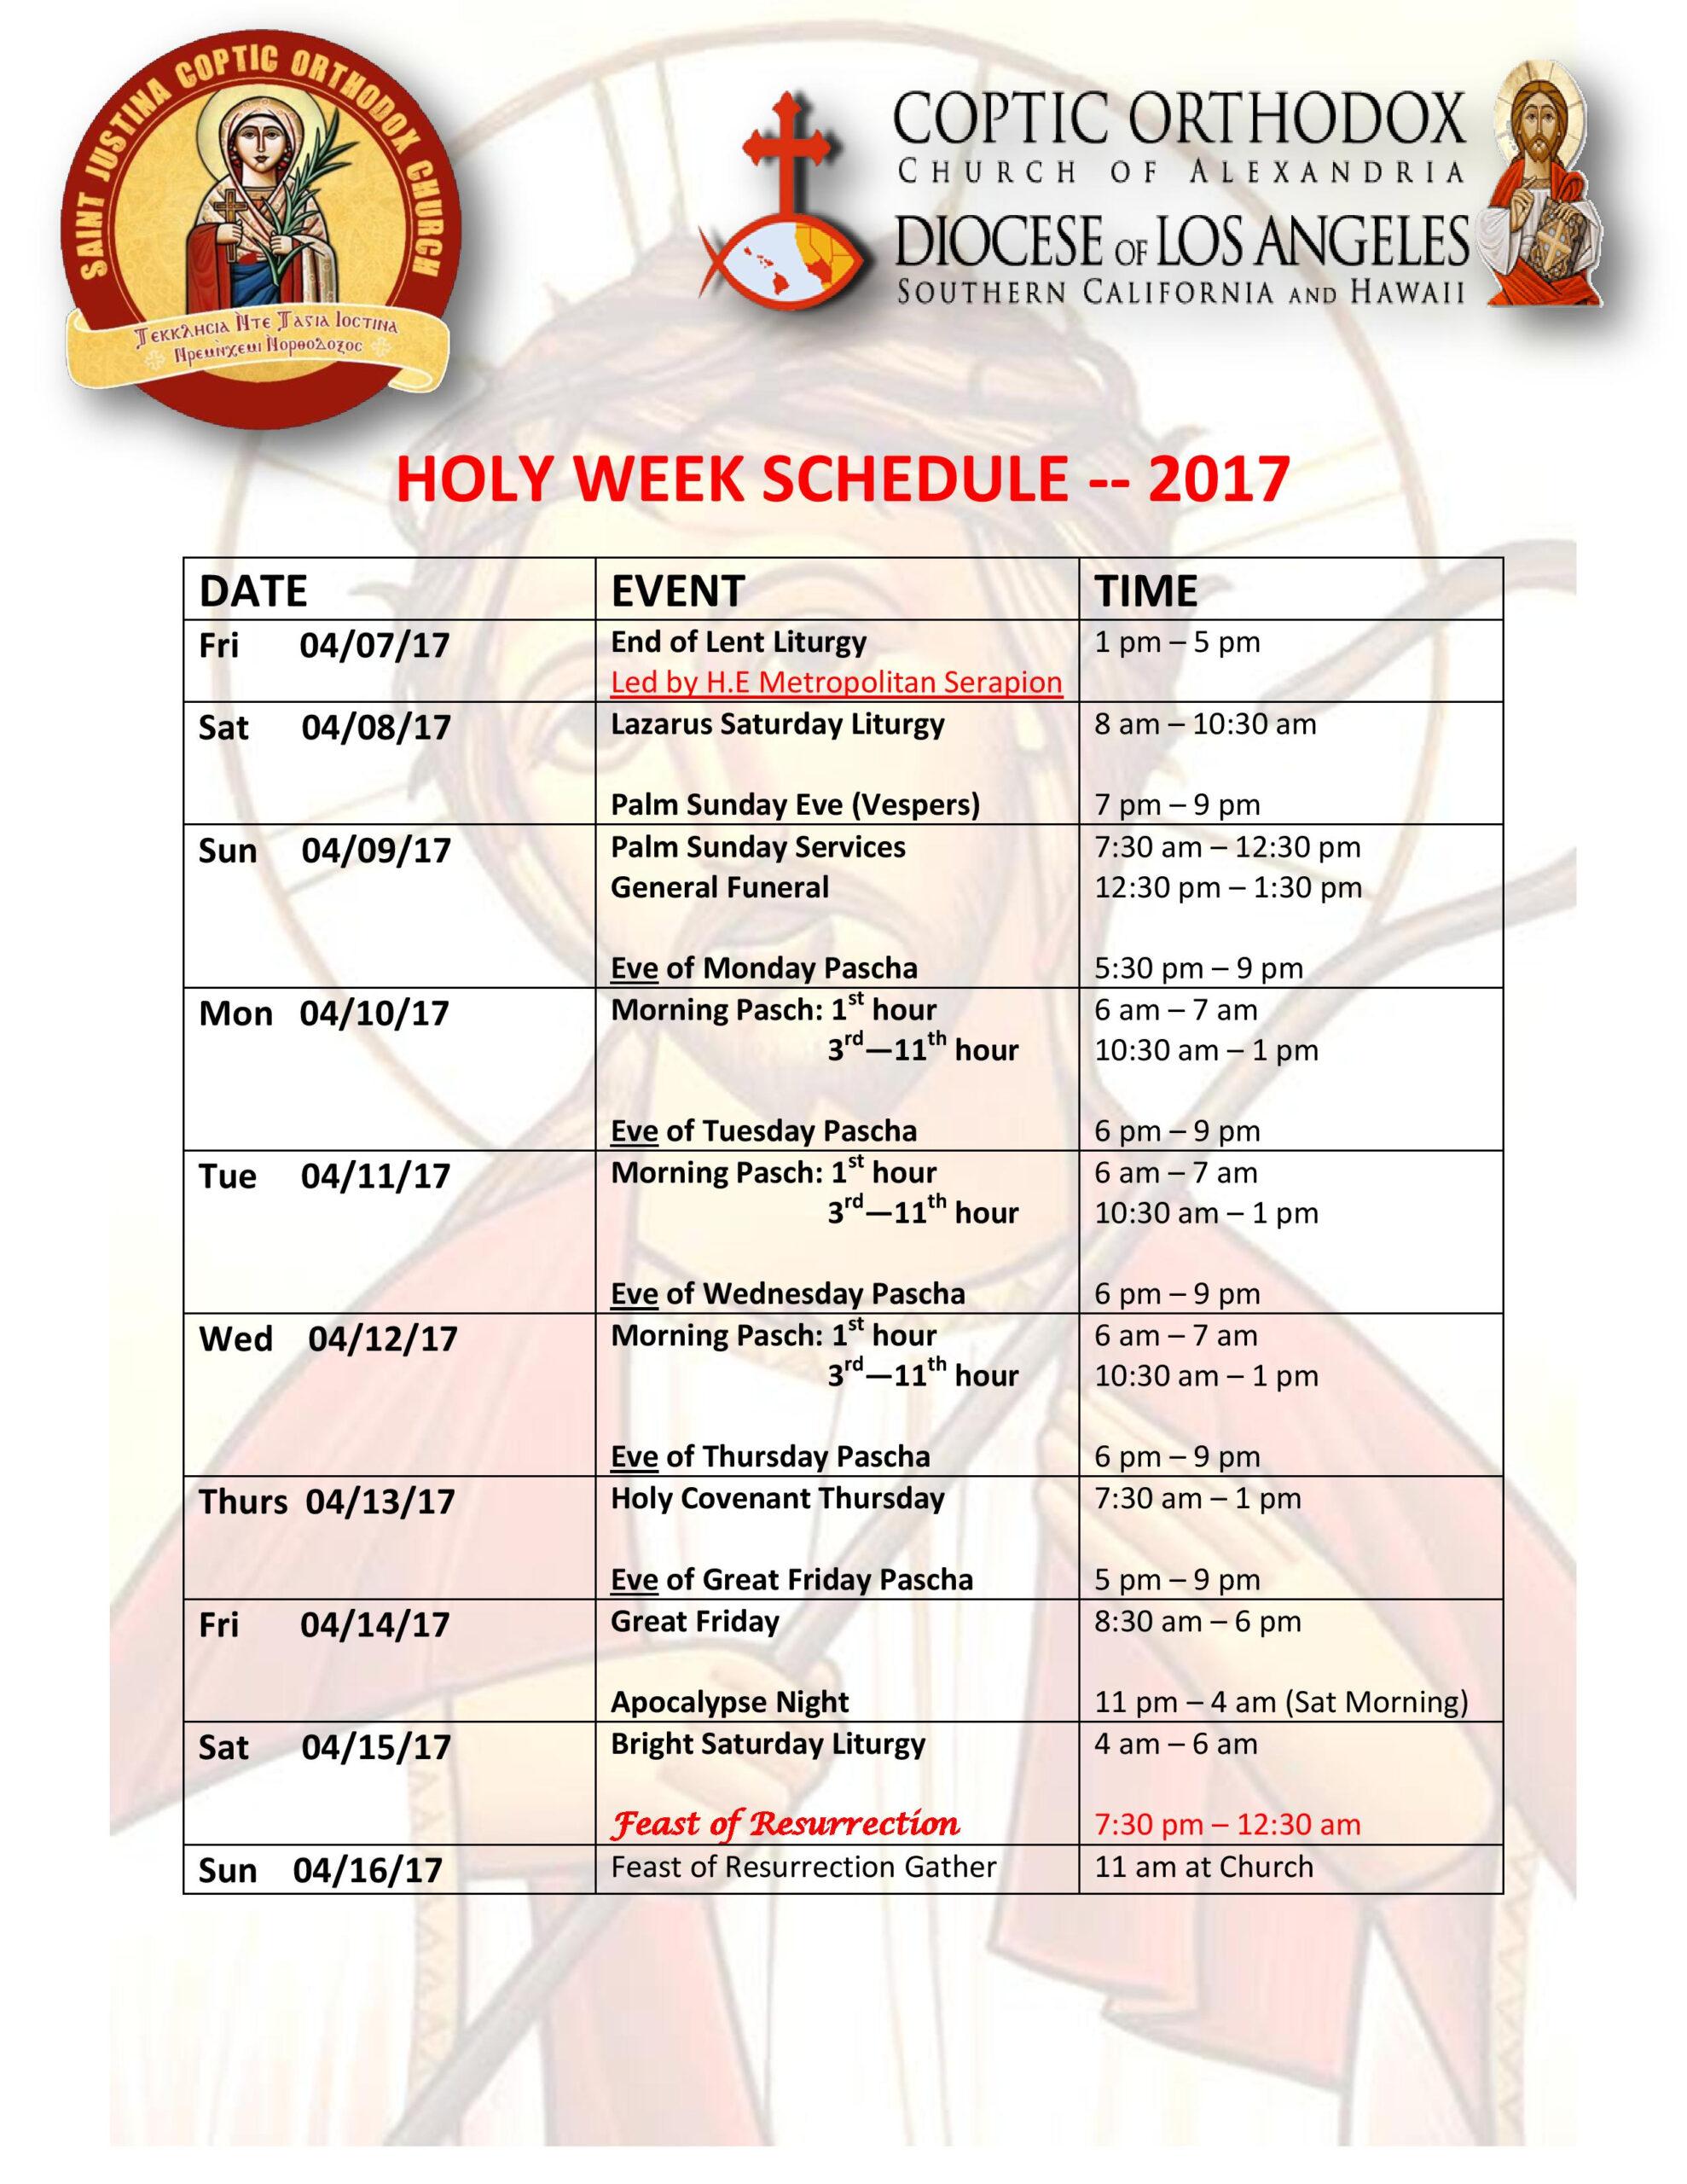 Holy Week Schedule 2017 - St Justina Coptic Orthodox Church